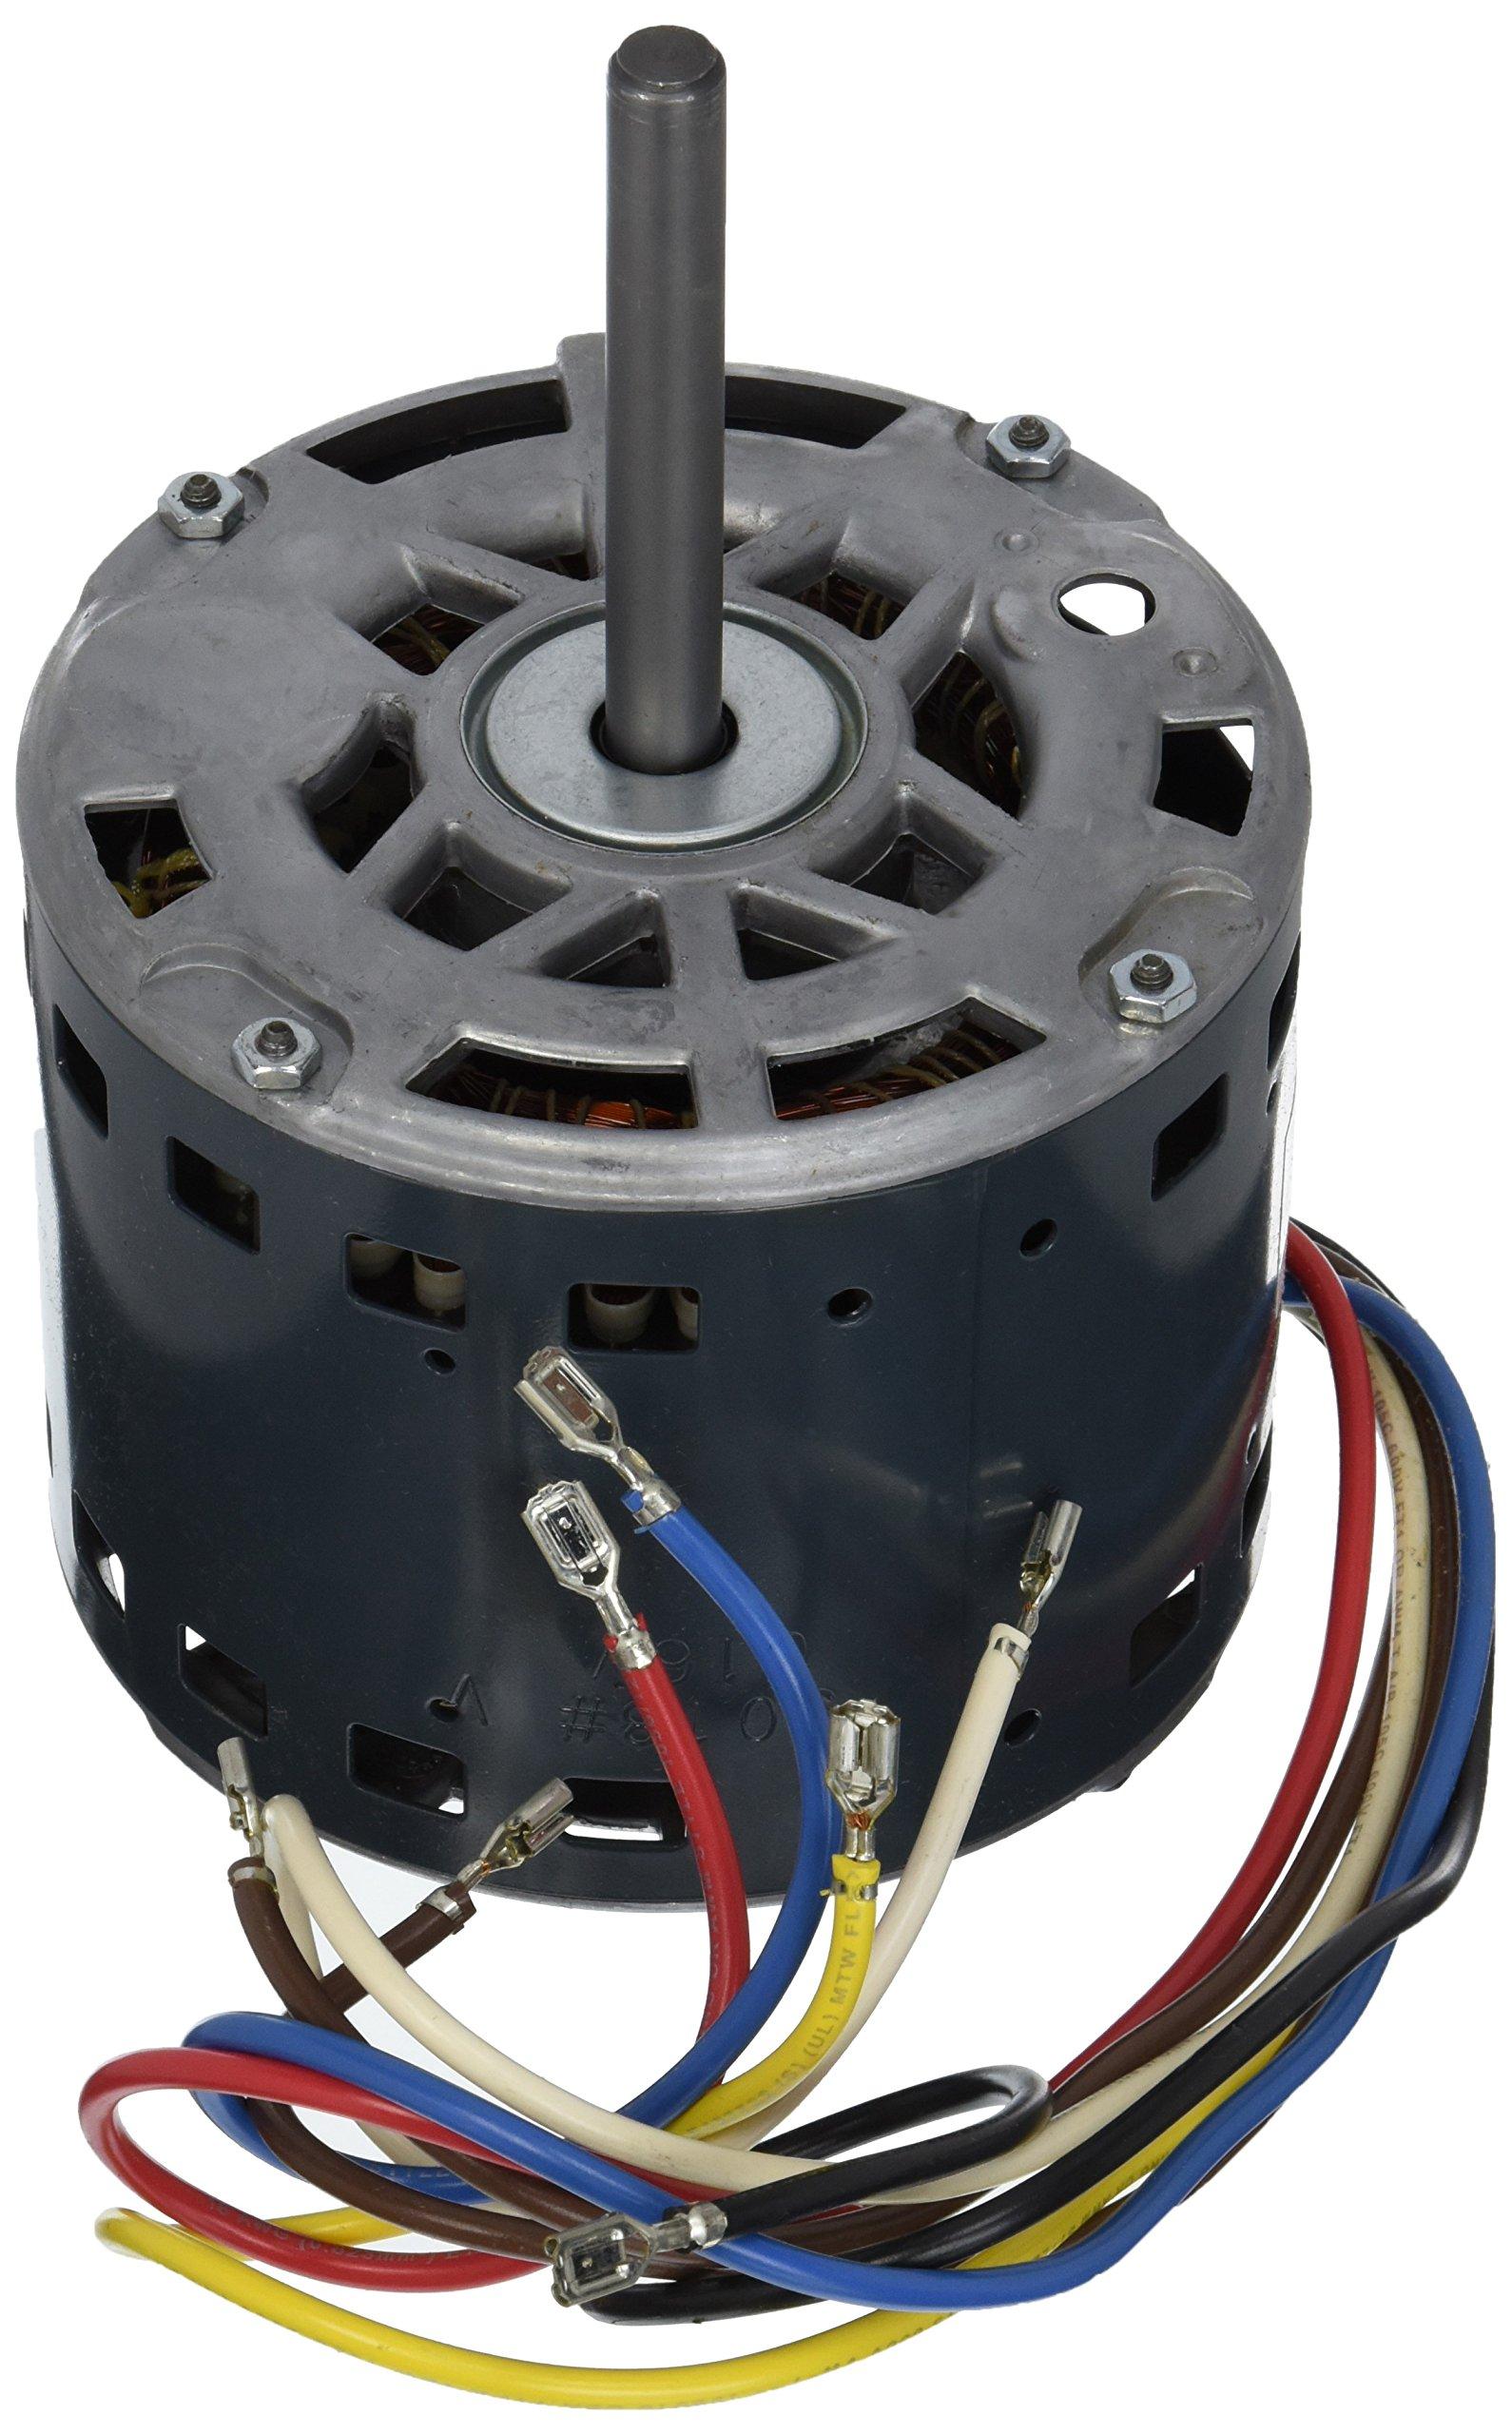 Protech 51-24070-02 1/2 hp 120/1/60 Blower Motor